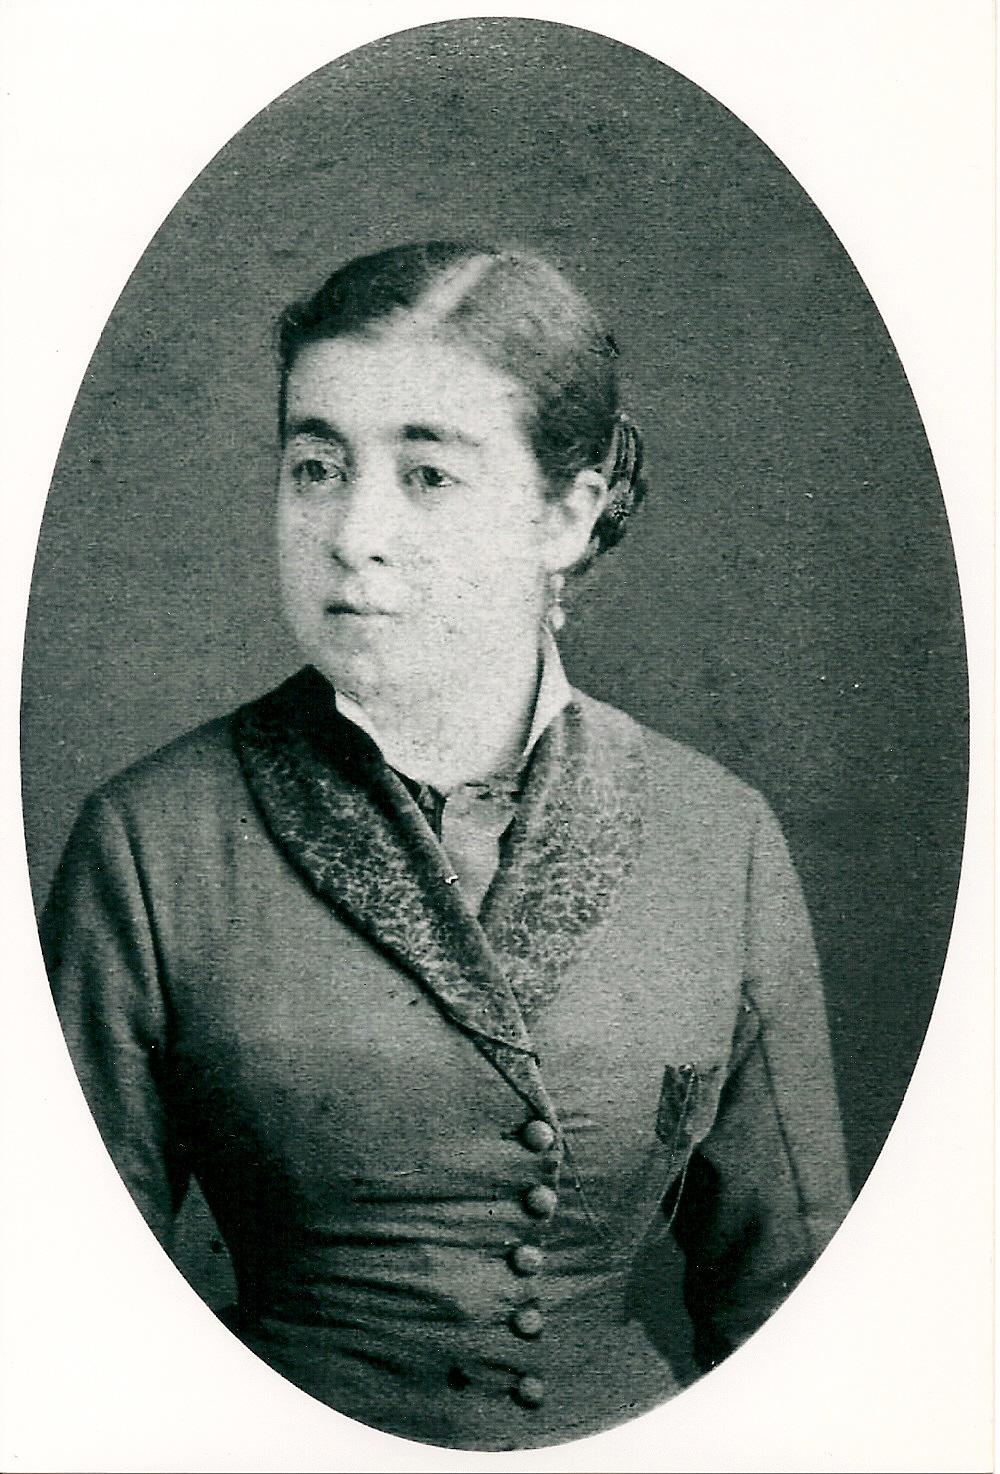 Vincentine BECCHI née MARTINI